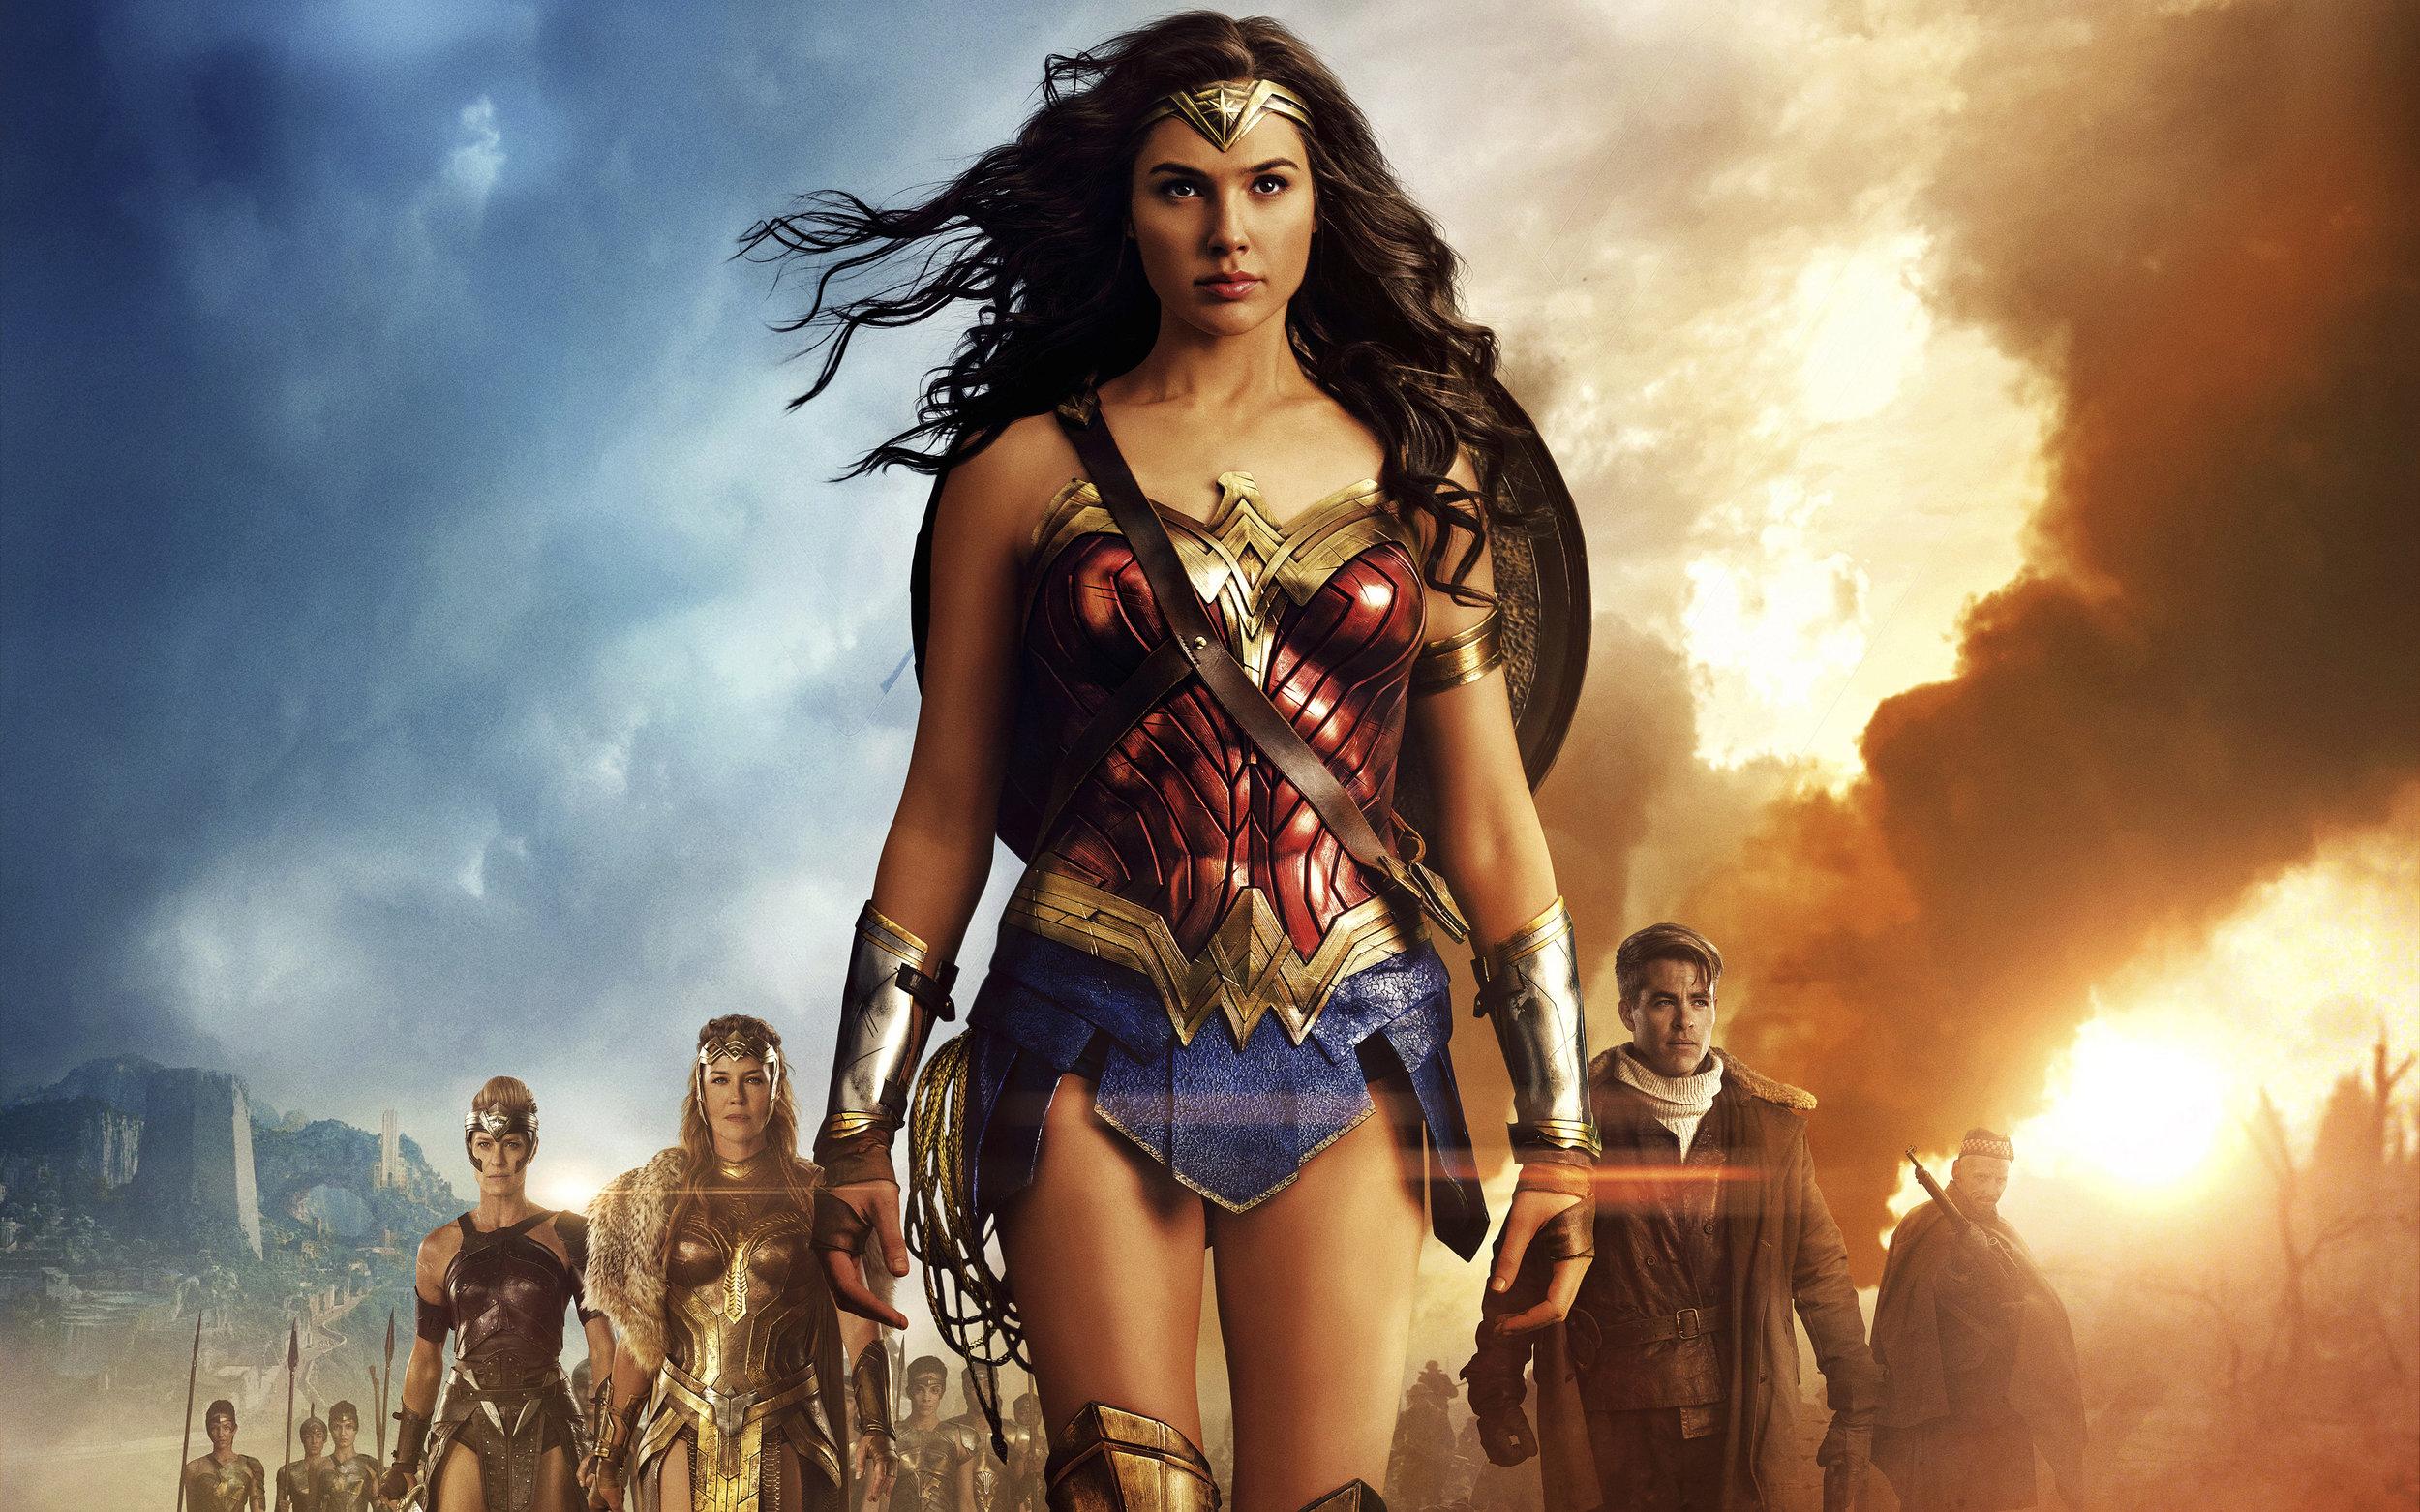 wonder-woman-5k-2017-movie-dx.jpg